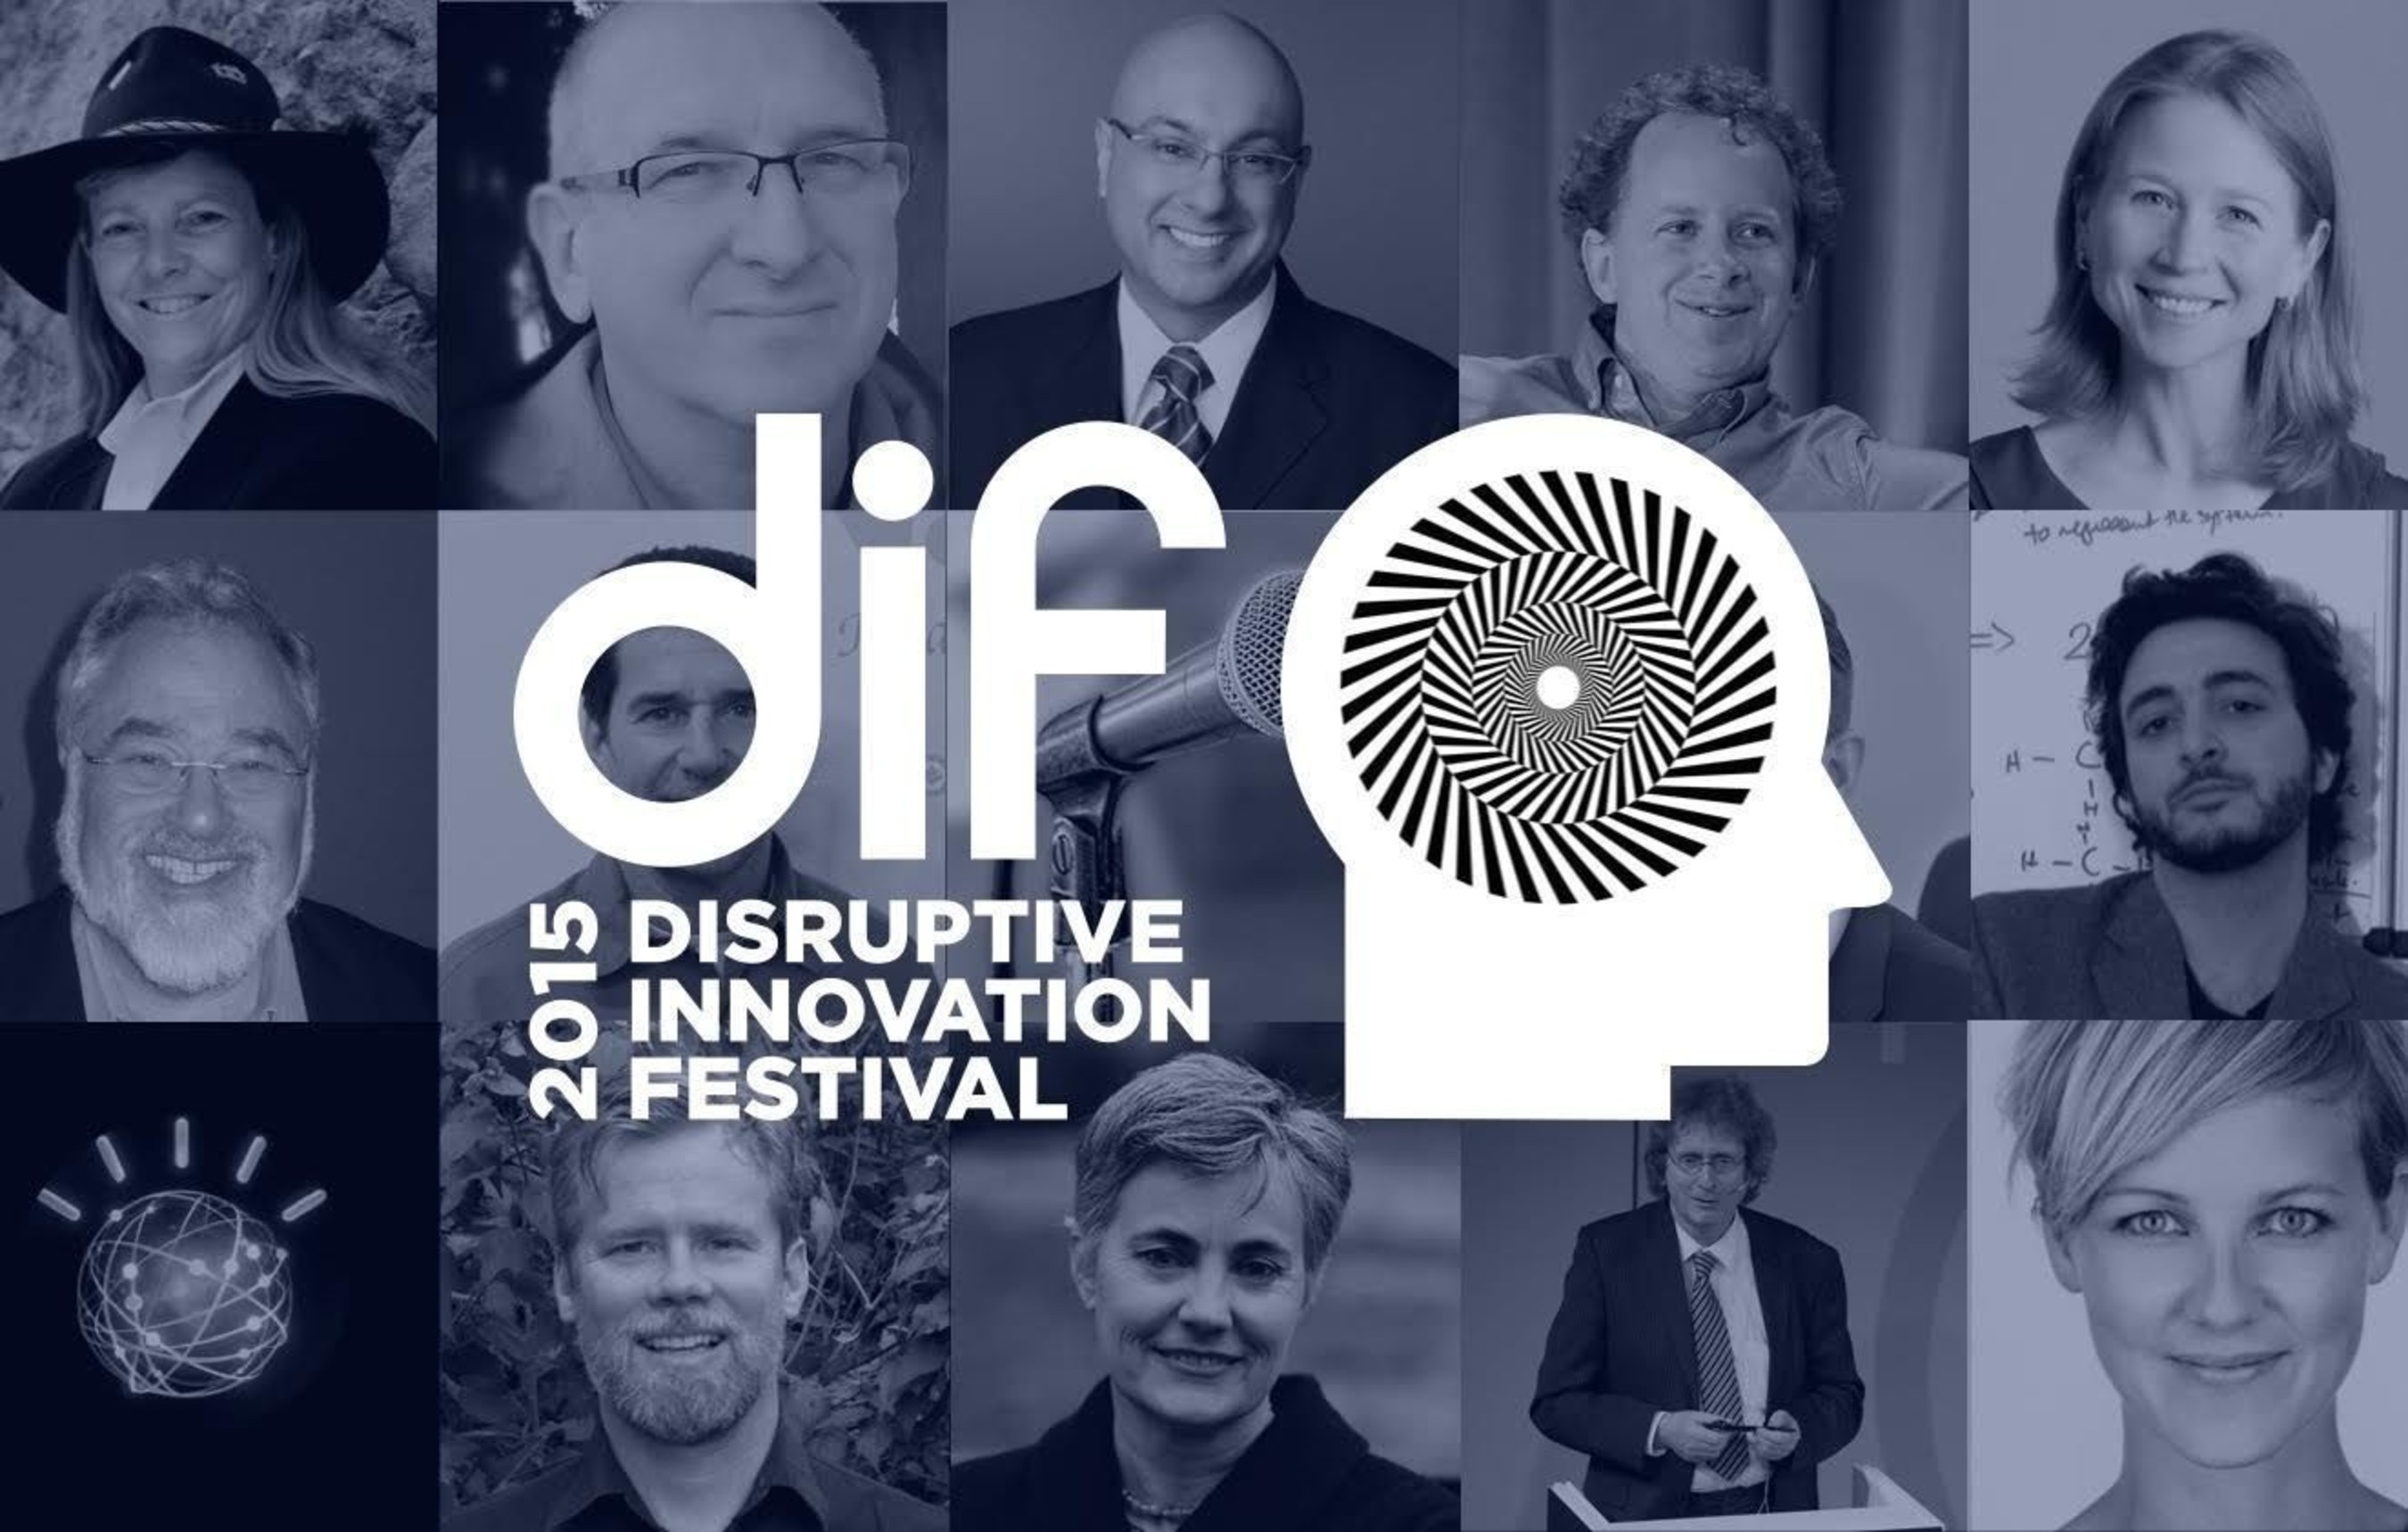 Disruptive Innovation Festival 2015 Announces Grand Finale Line-up and Latest Headline Speaker